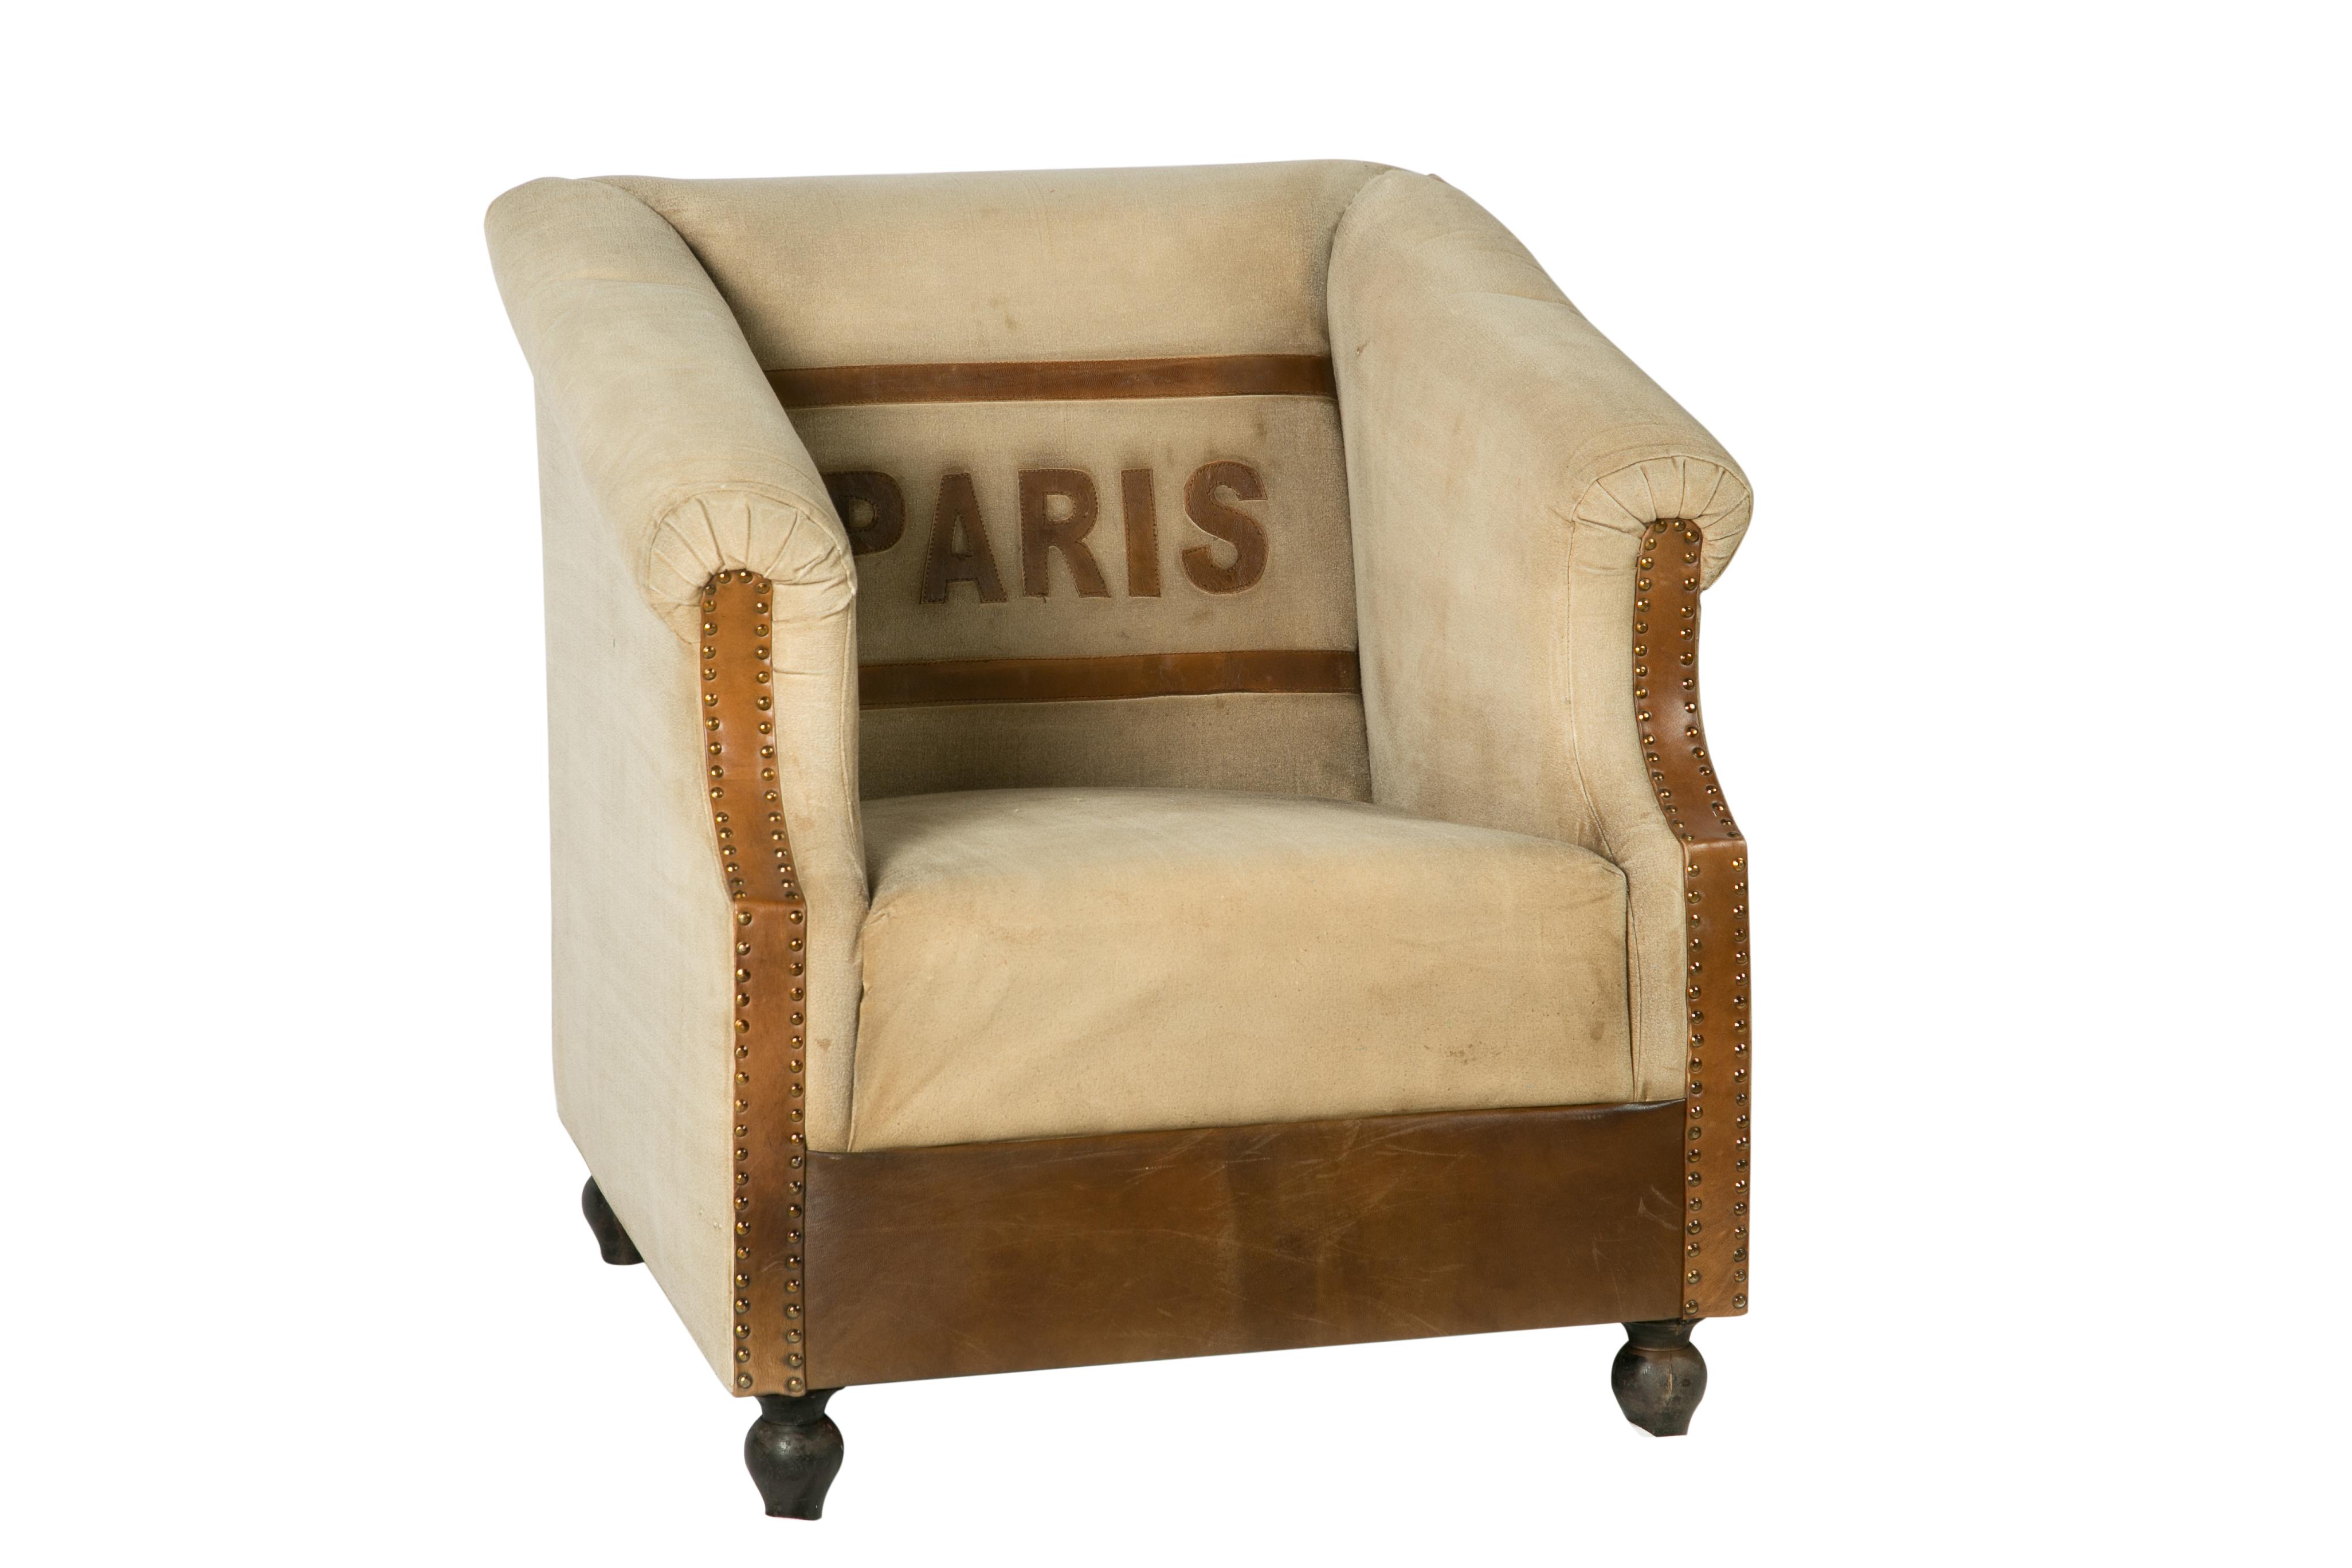 КреслоИнтерьерные кресла<br><br><br>Material: Текстиль<br>Width см: 75<br>Depth см: 80<br>Height см: 75